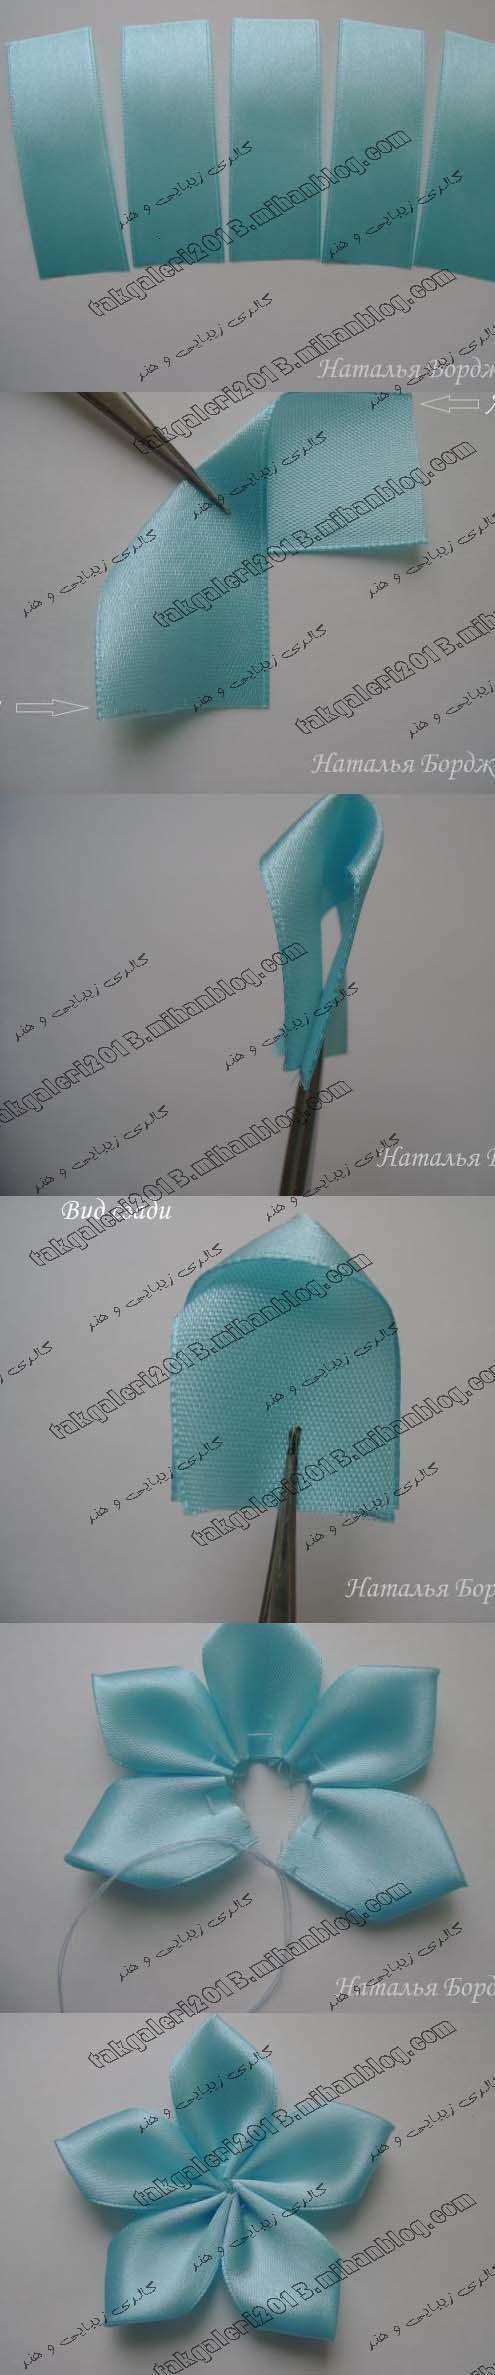 http://s1.picofile.com/file/7969262468/robani_1_.jpg